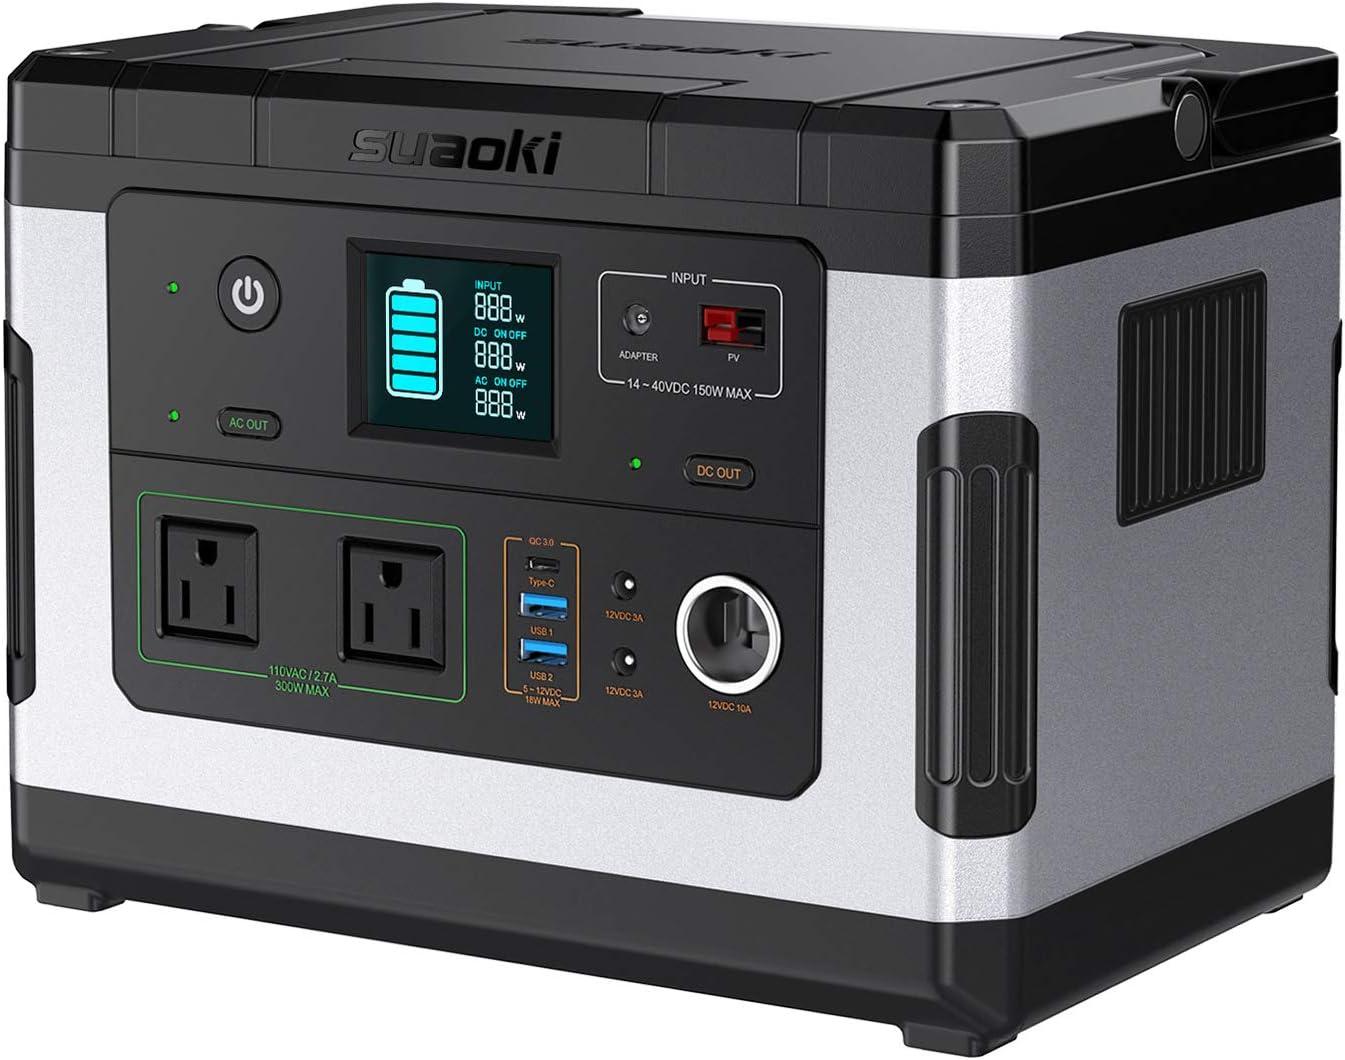 <br /> suaoki ポータブル電源 G500 137700mAh